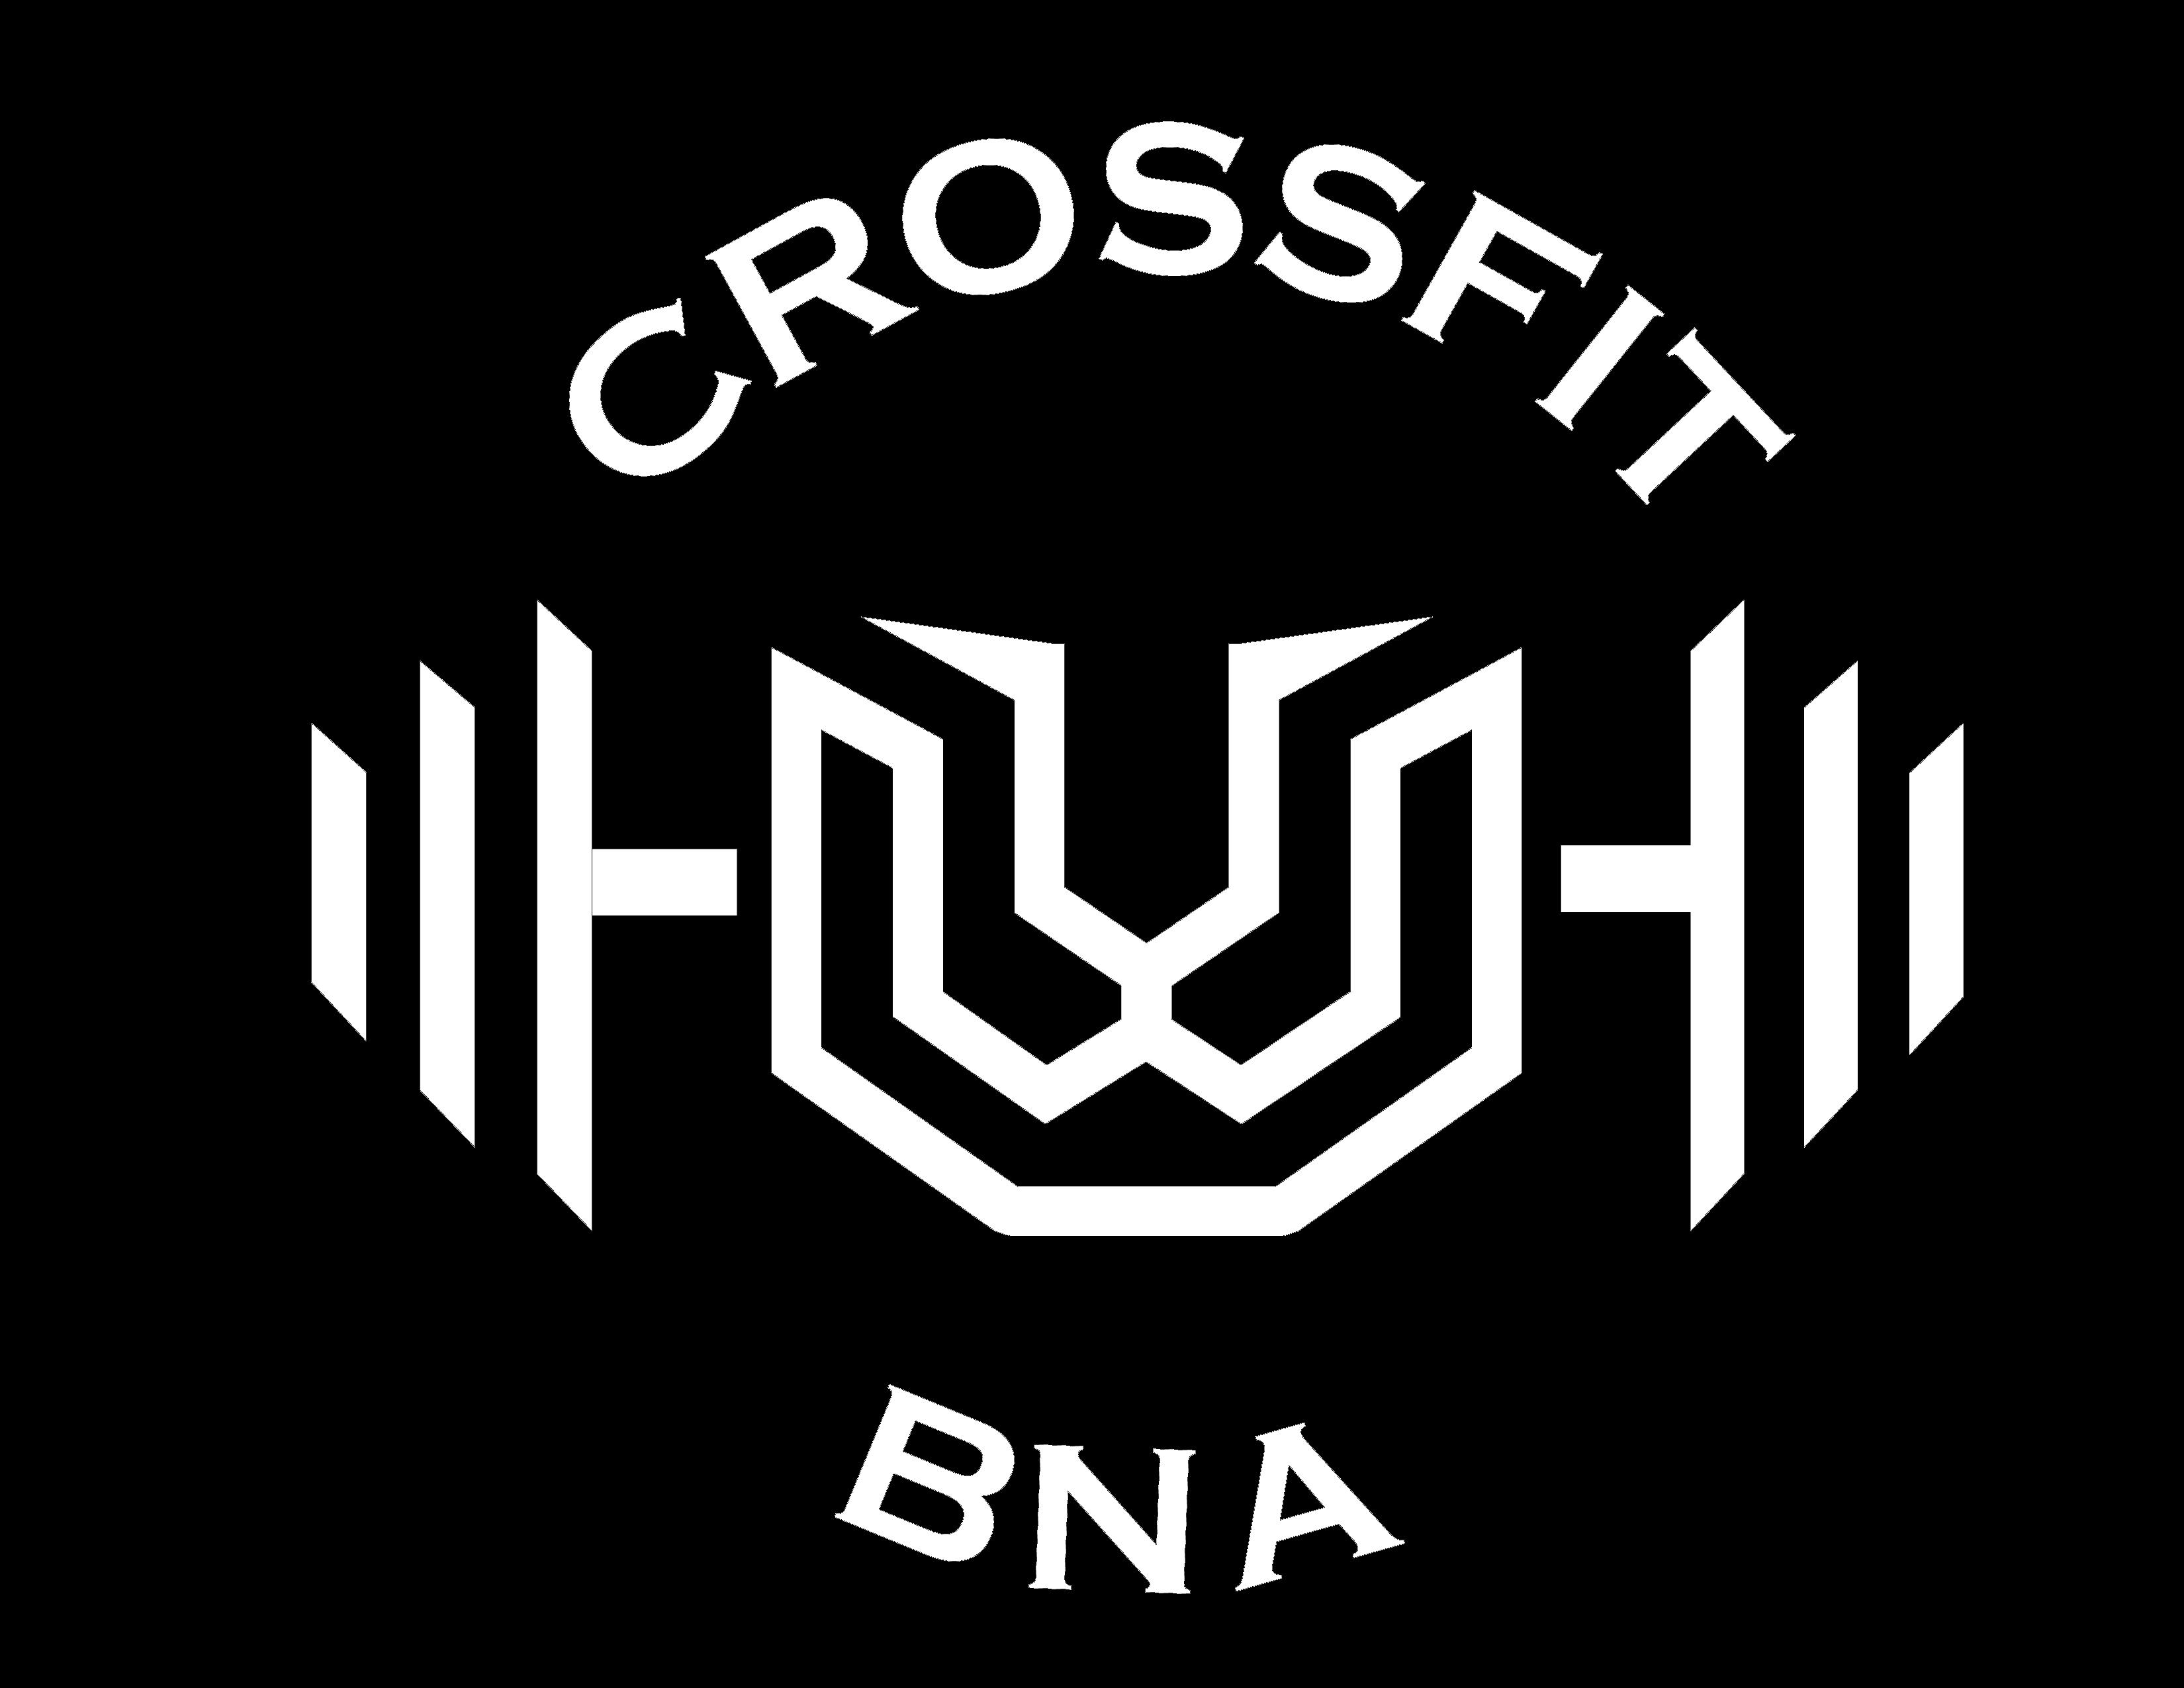 CrossFit BNA logo